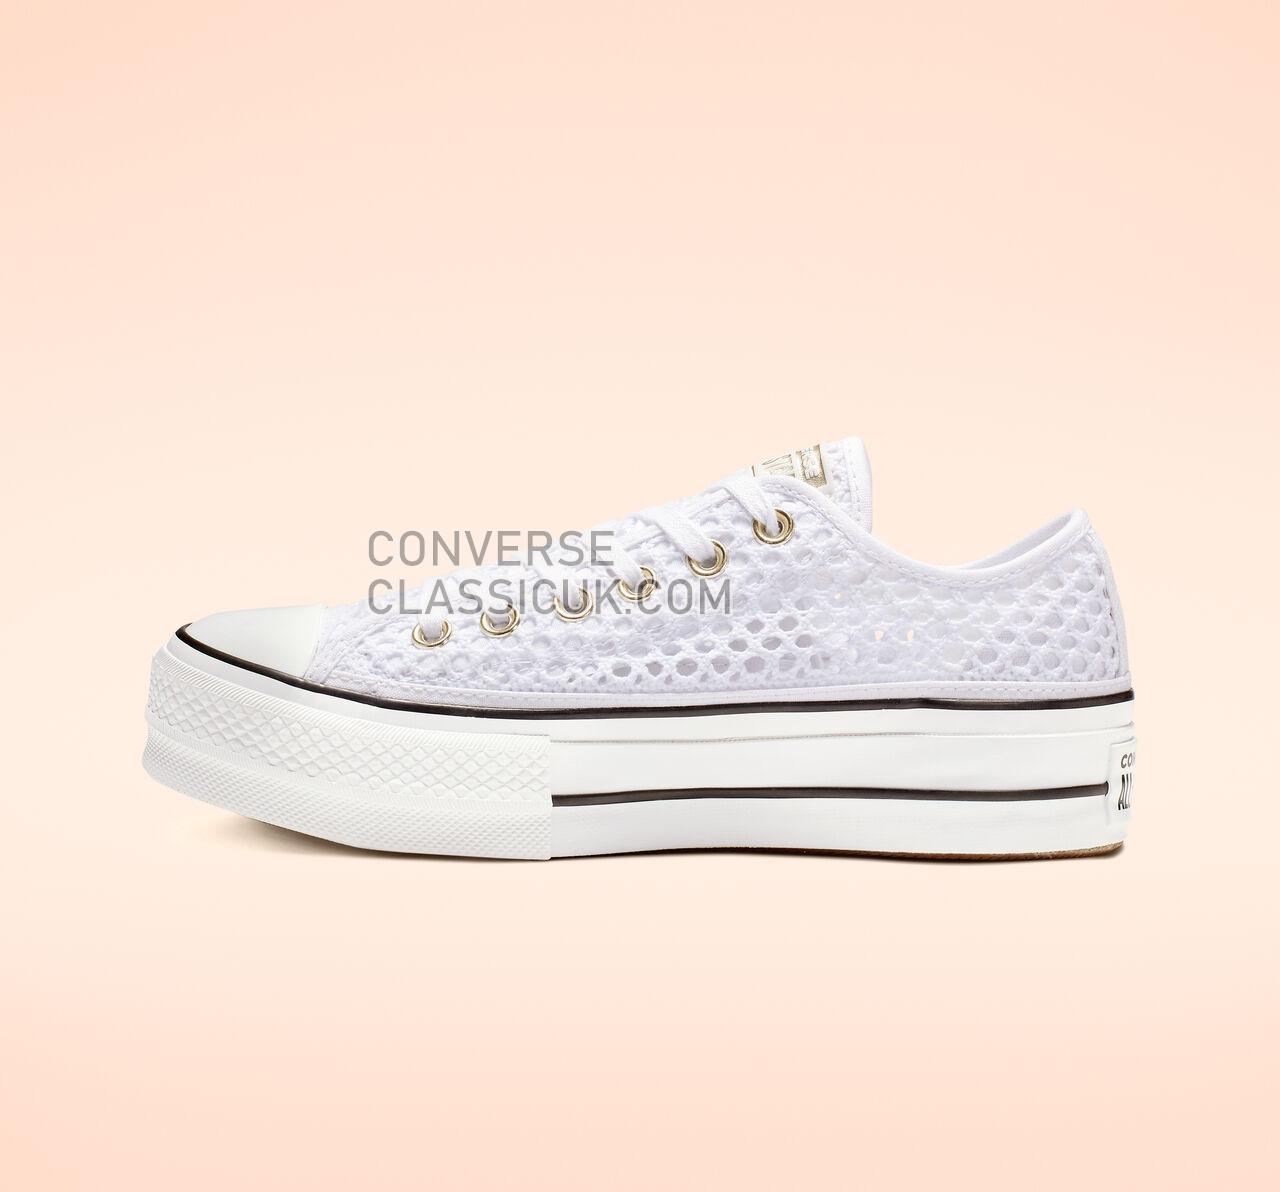 Converse Chuck Taylor All Star Crochet Platform Low Top Womens 564873C White/White/Black Shoes